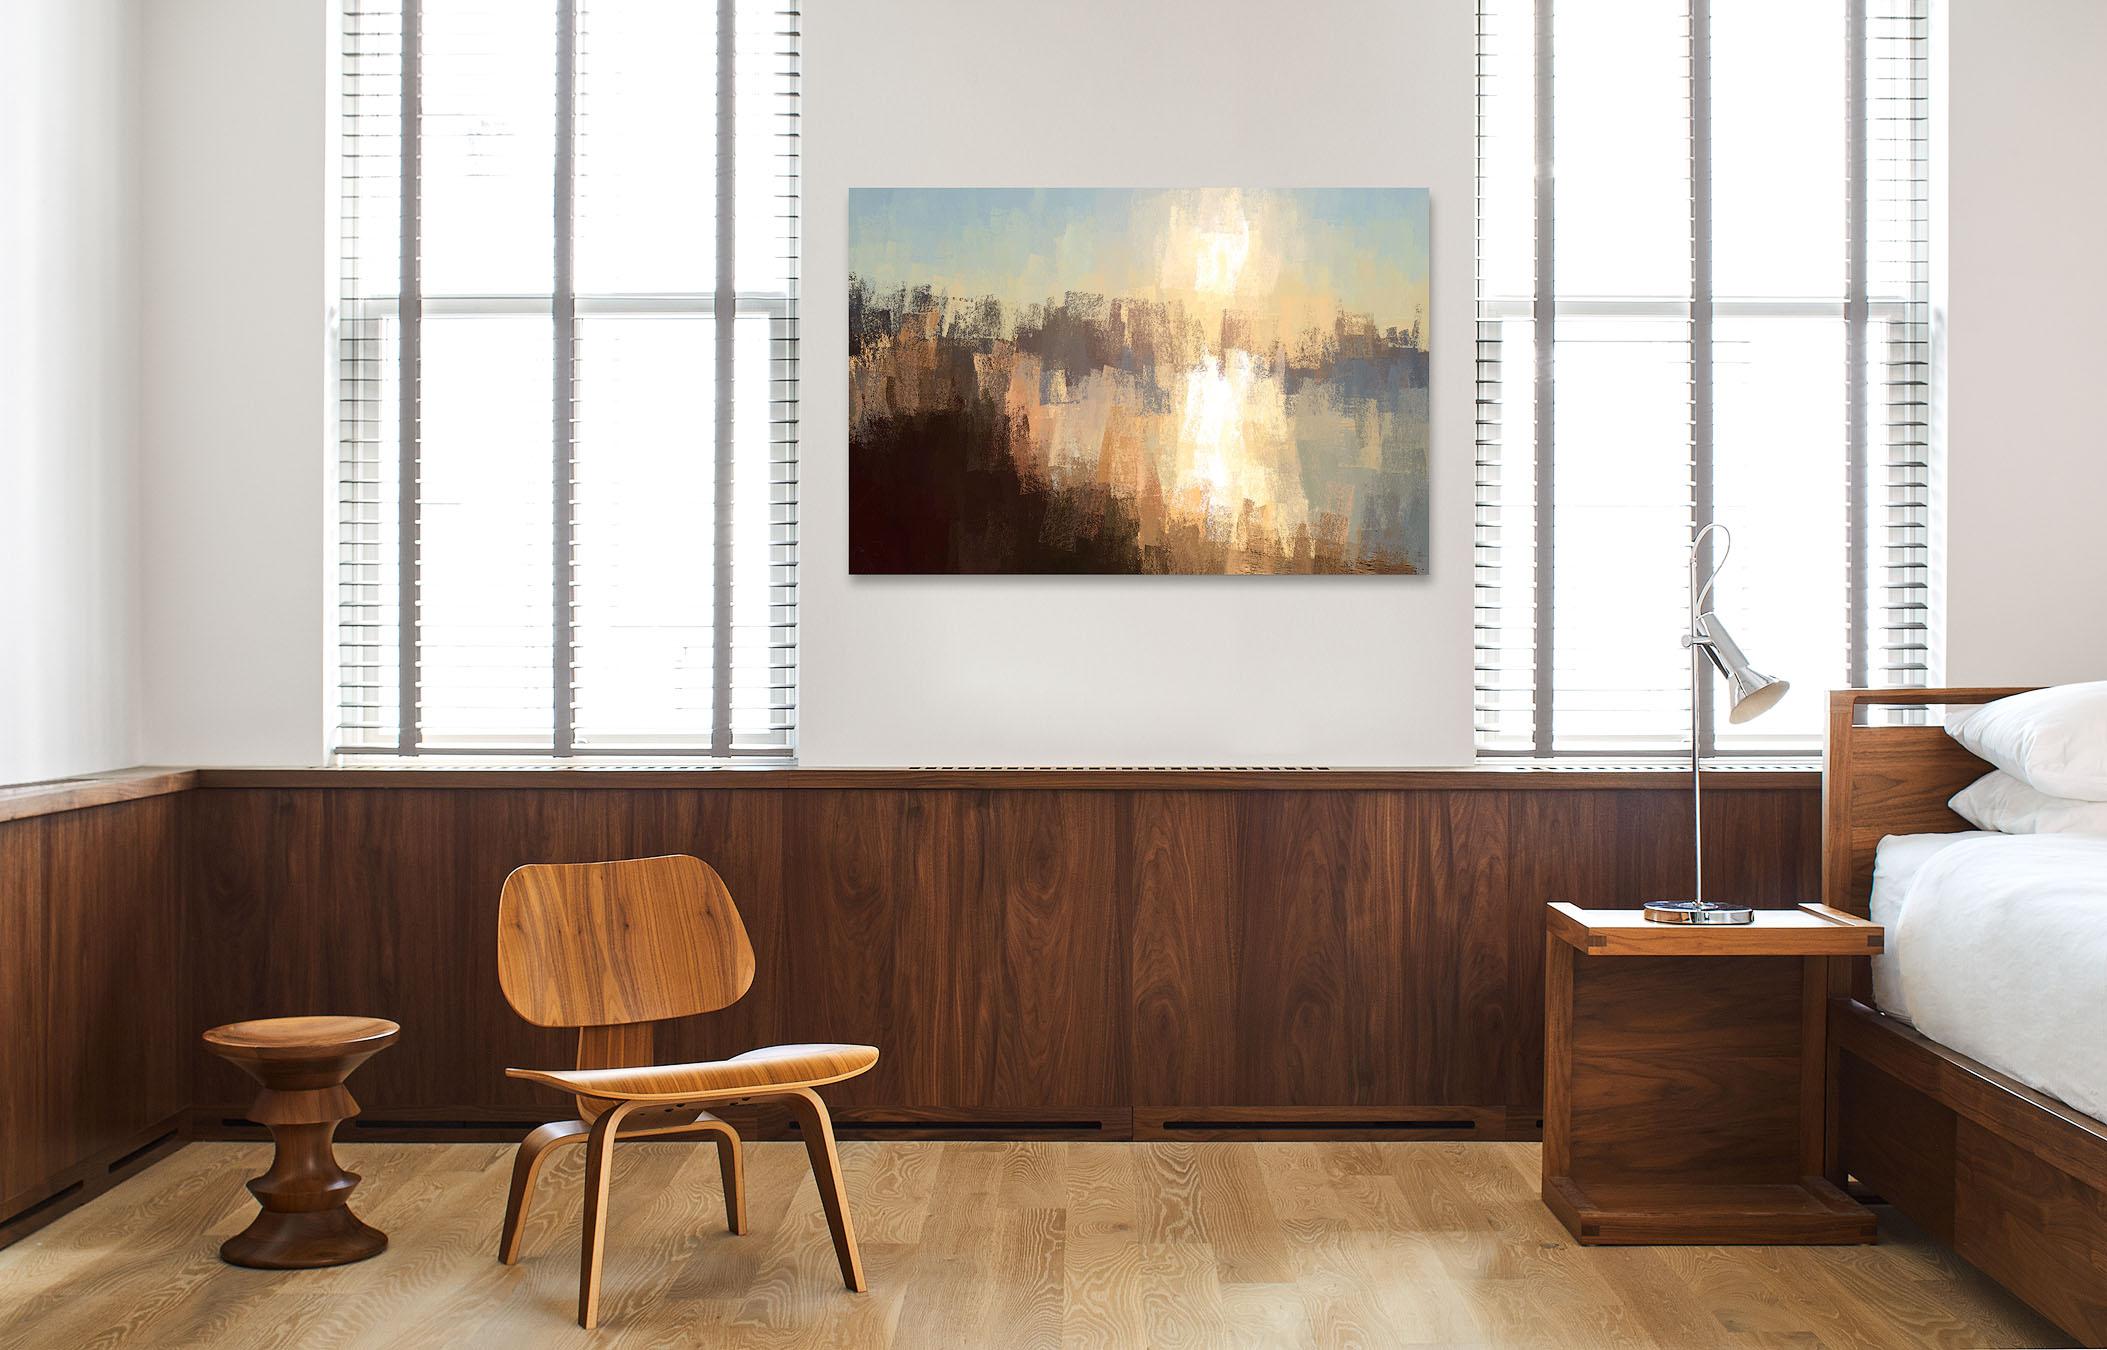 turkel_design_modern_prefab_home_soho_loft_bedroom.jpg